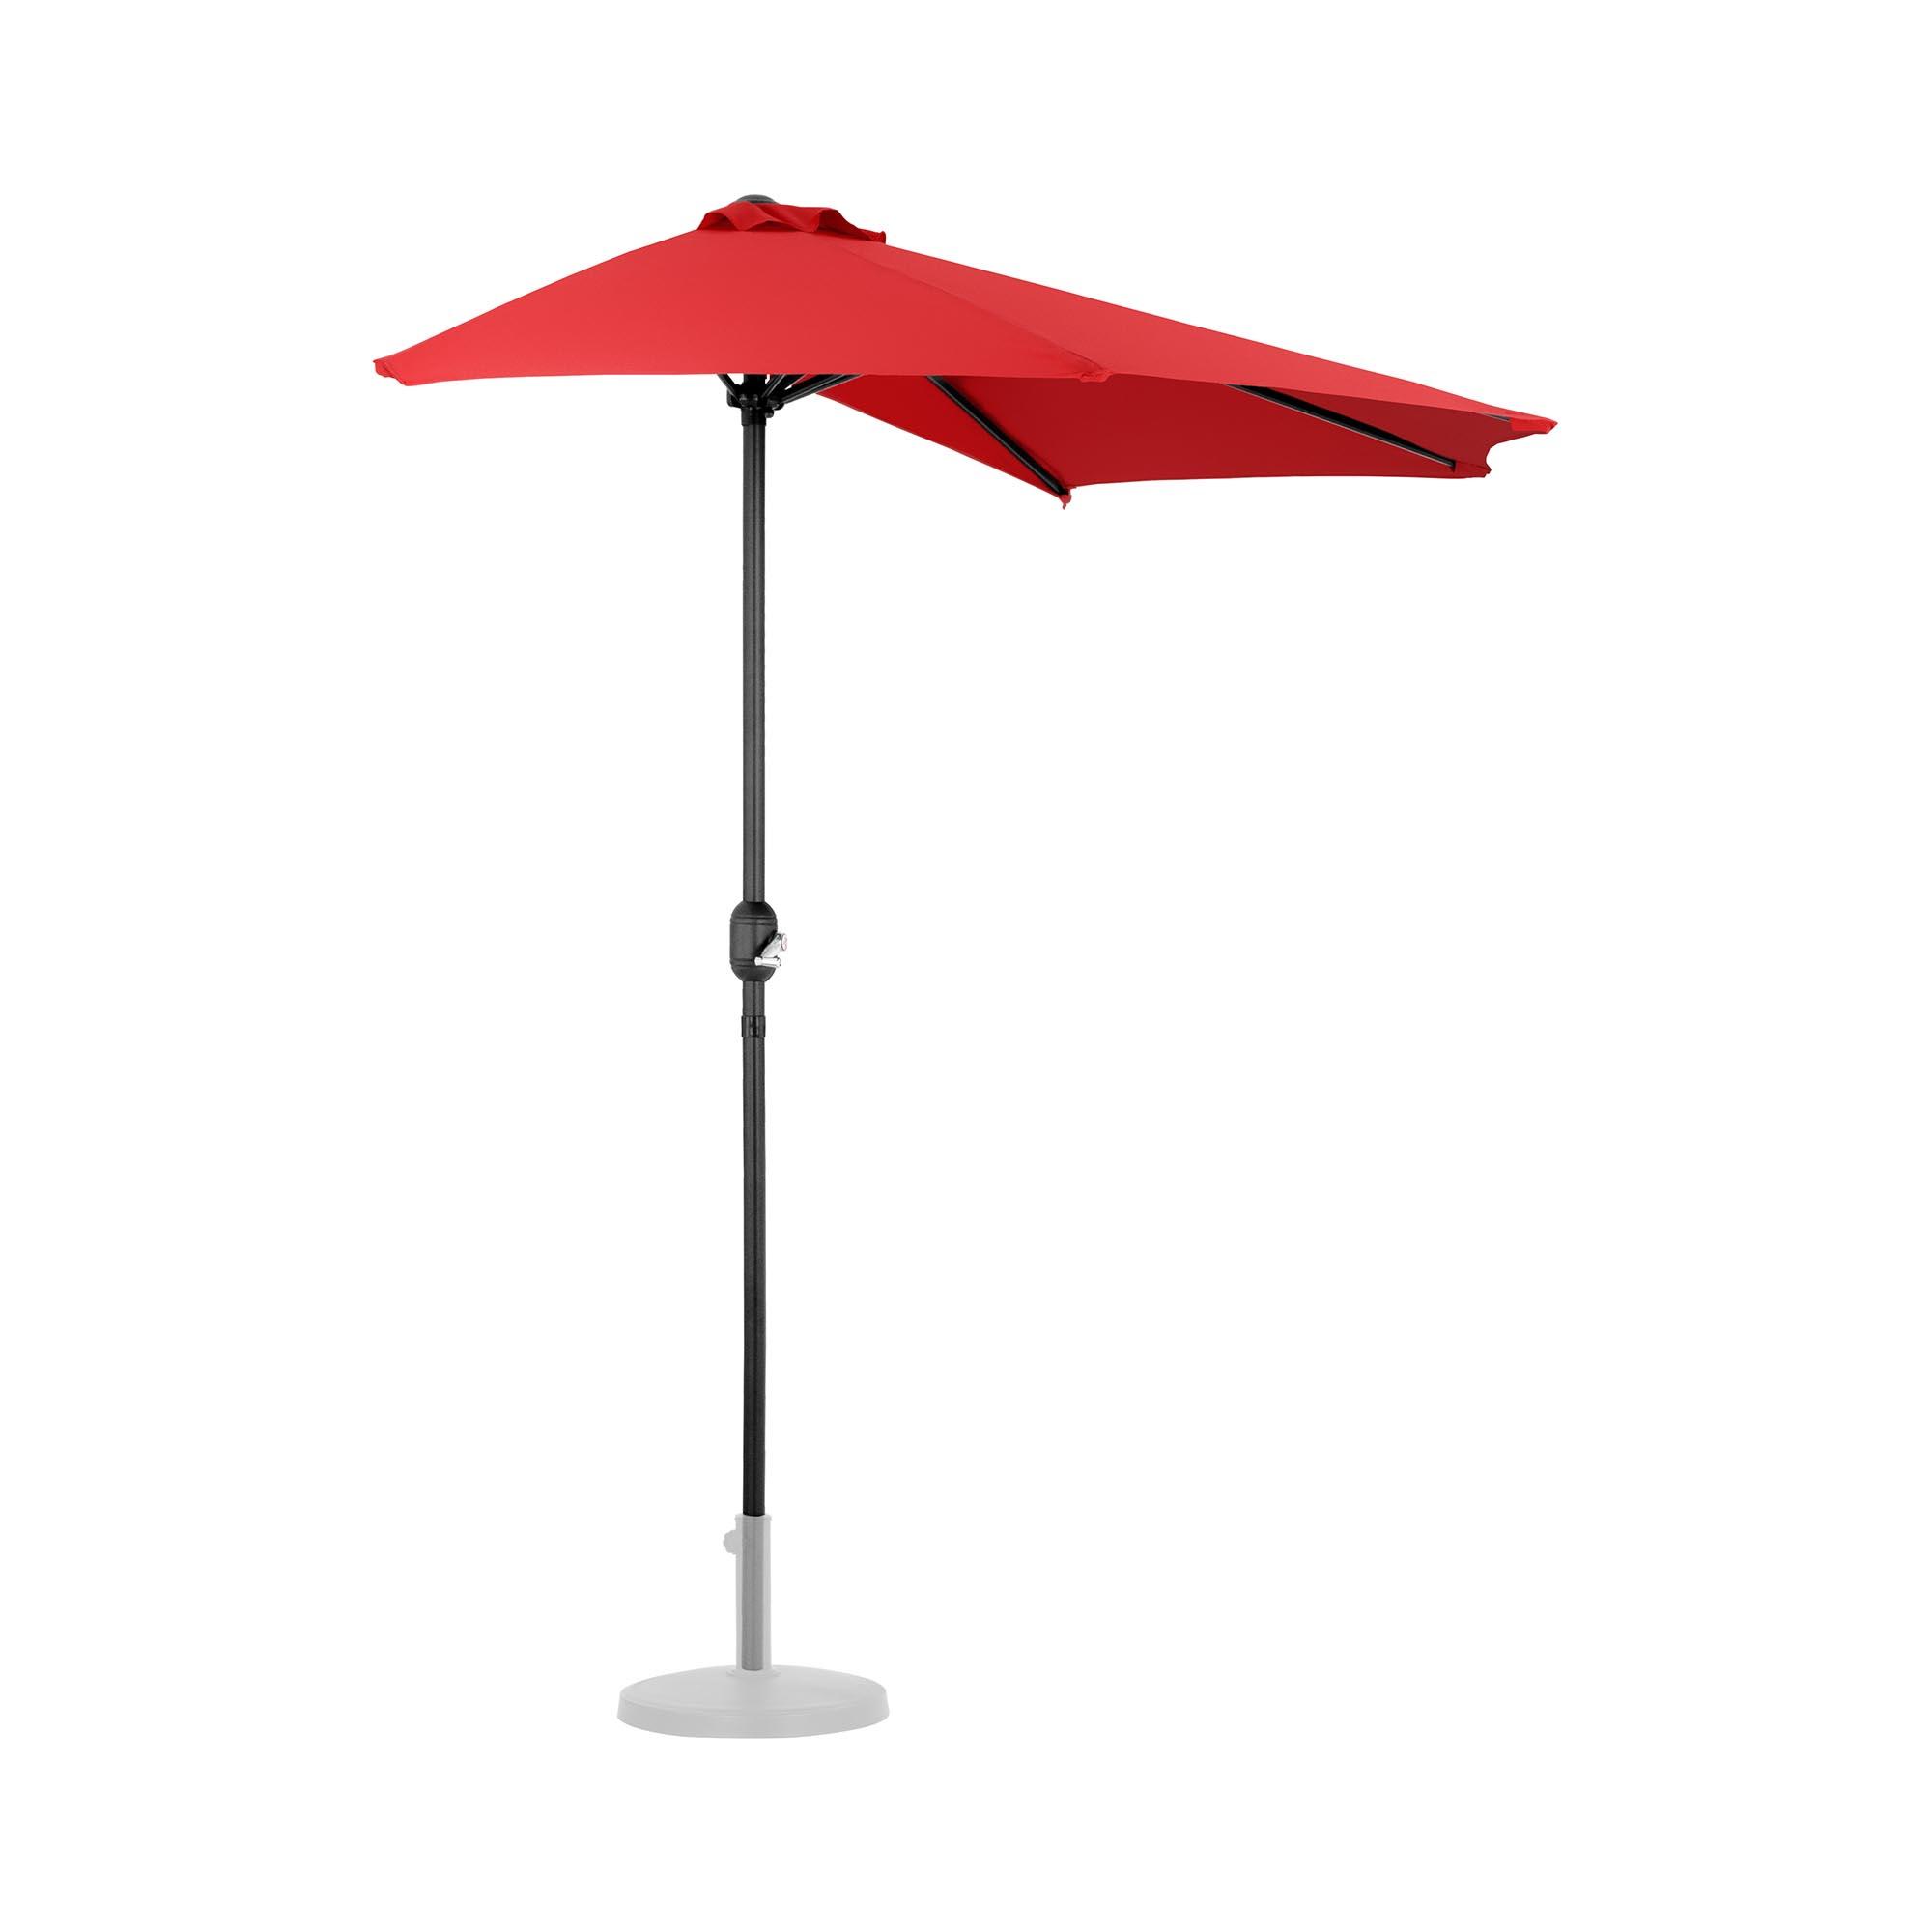 Uniprodo Halber Sonnenschirm - Rot - fünfeckig - 270 x 135 cm UNI_HALFUMBRELLA_R300RE